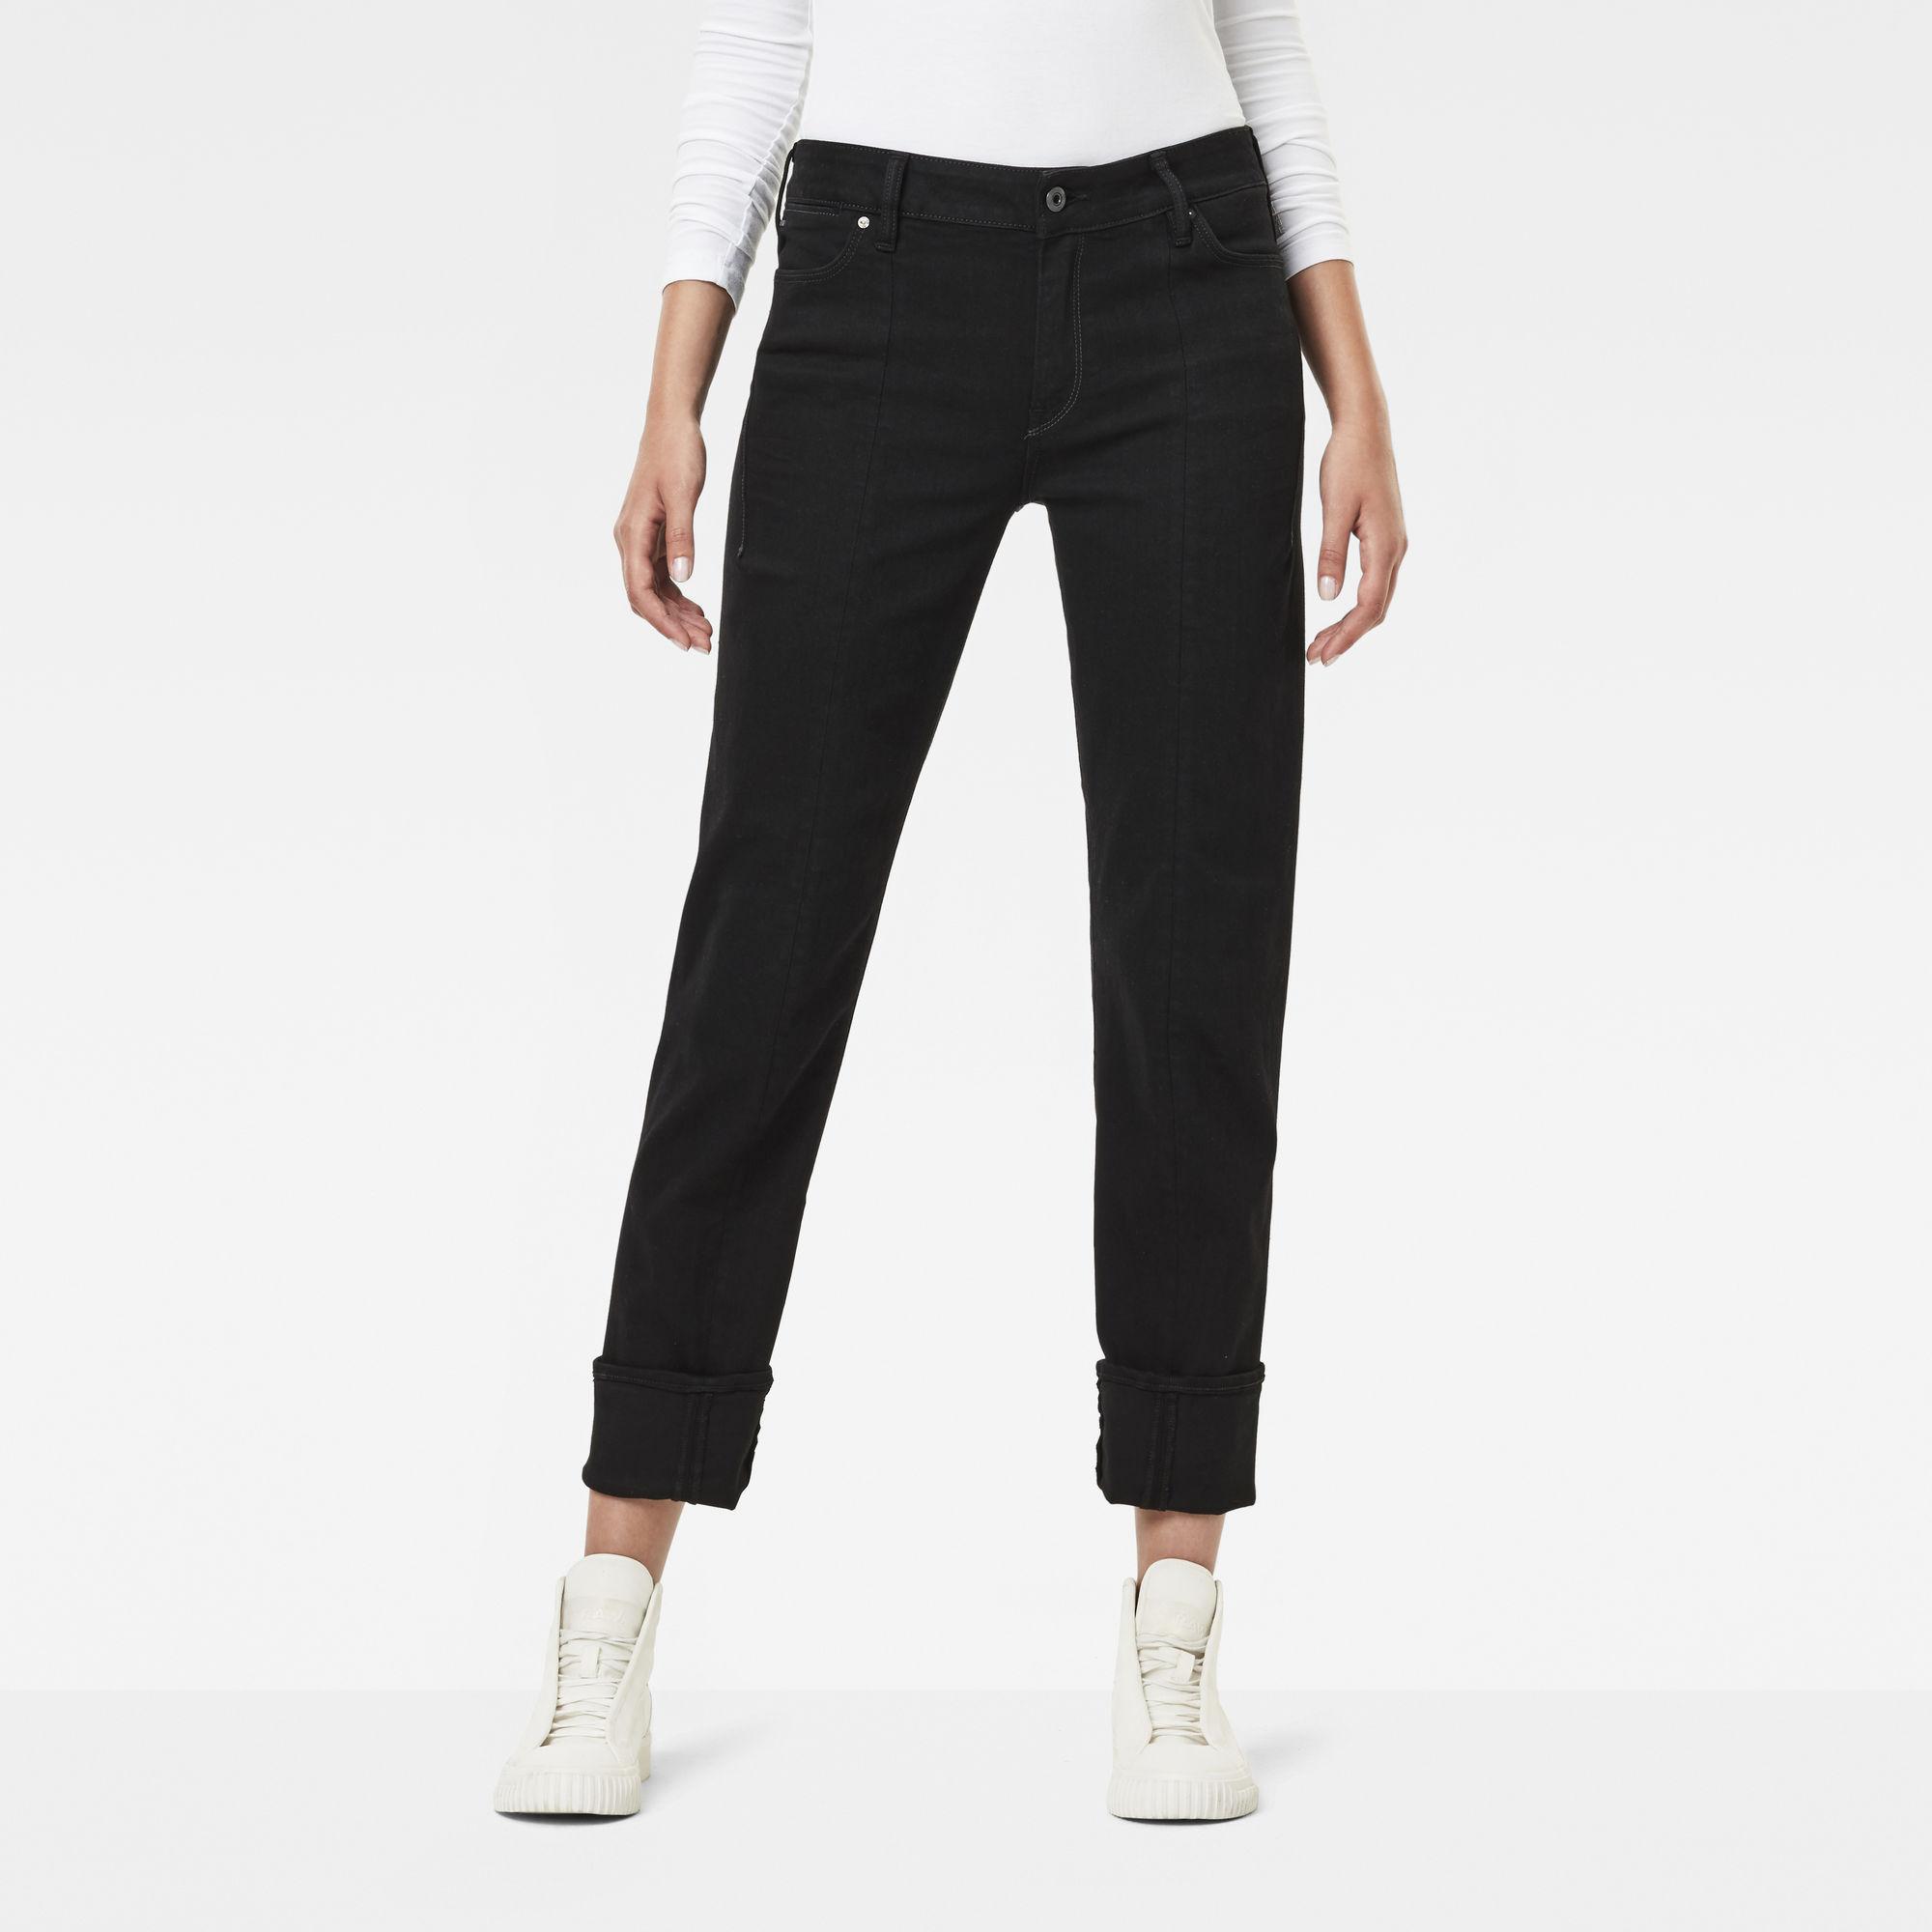 Lanc 3D High-Waist Straight Jeans